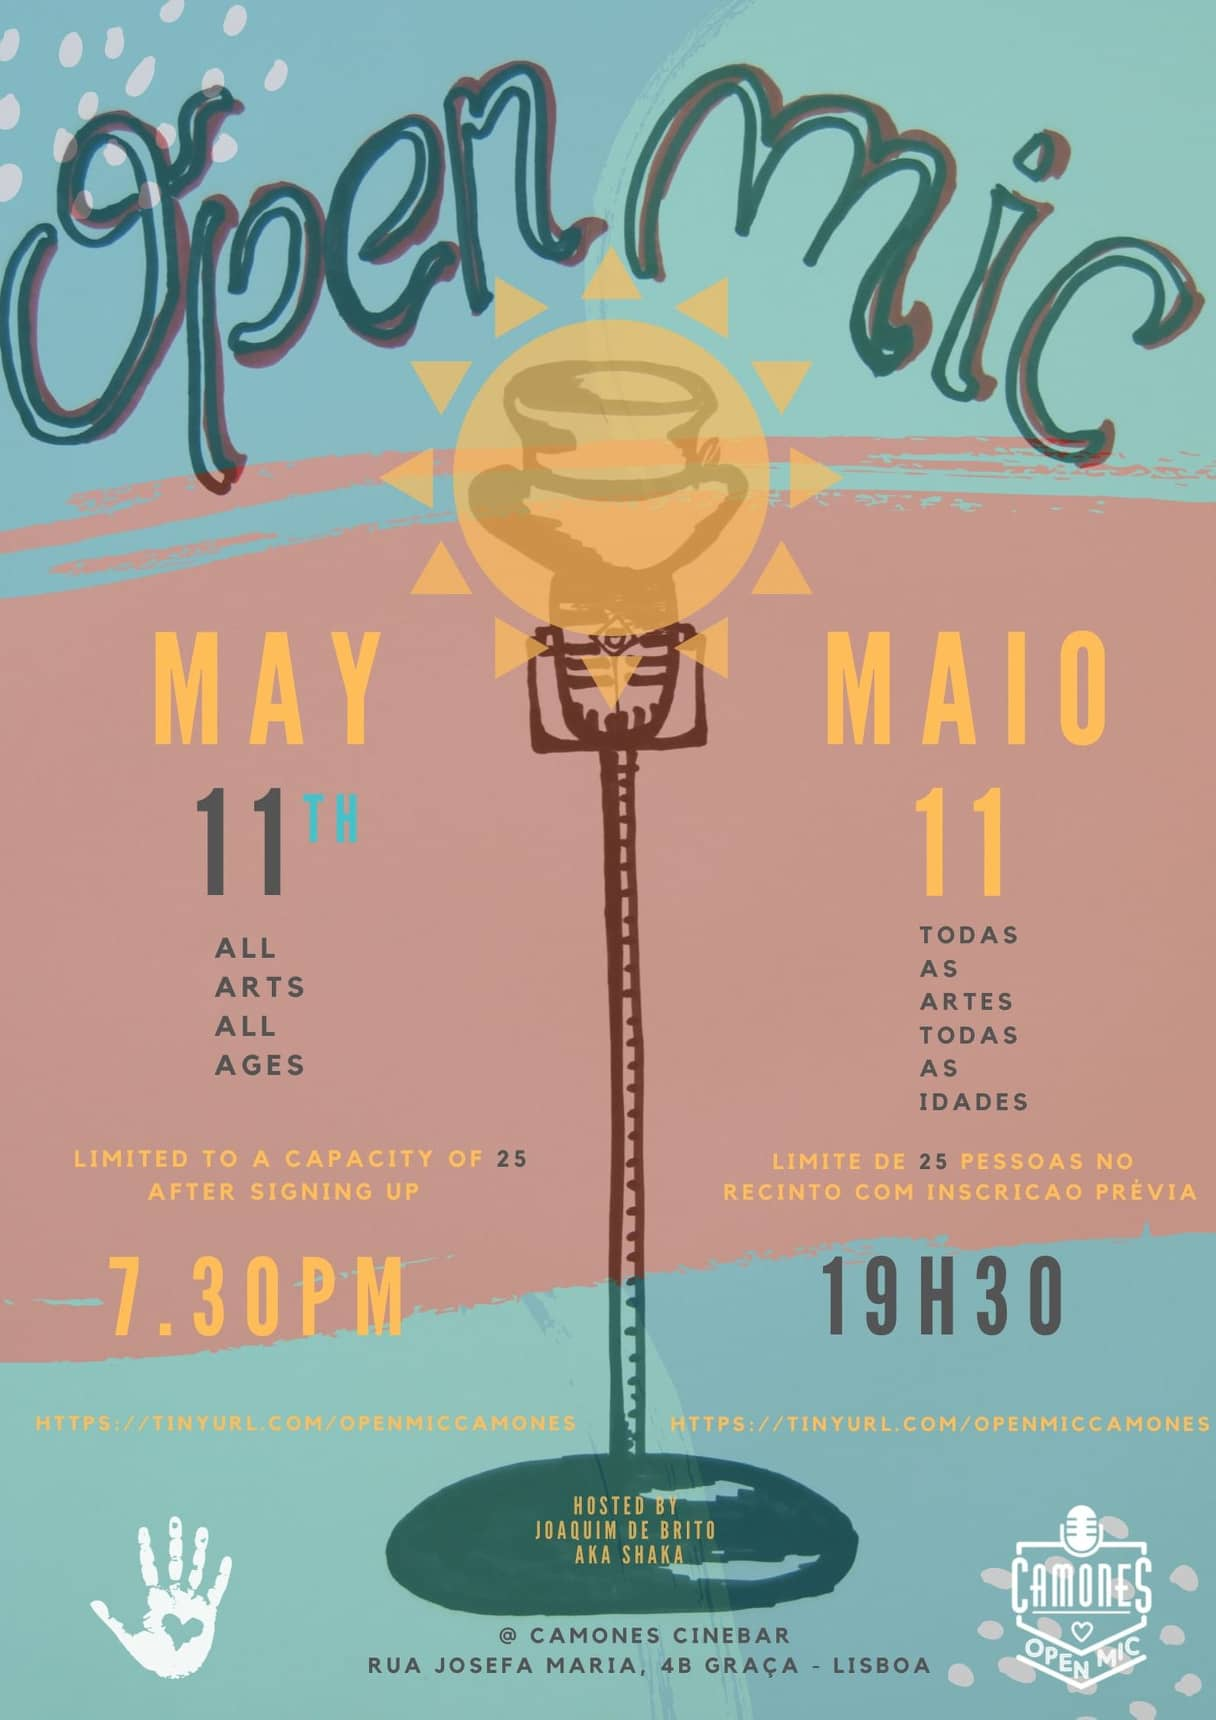 Open Mic - 66ª edição - All Arts, All Ages